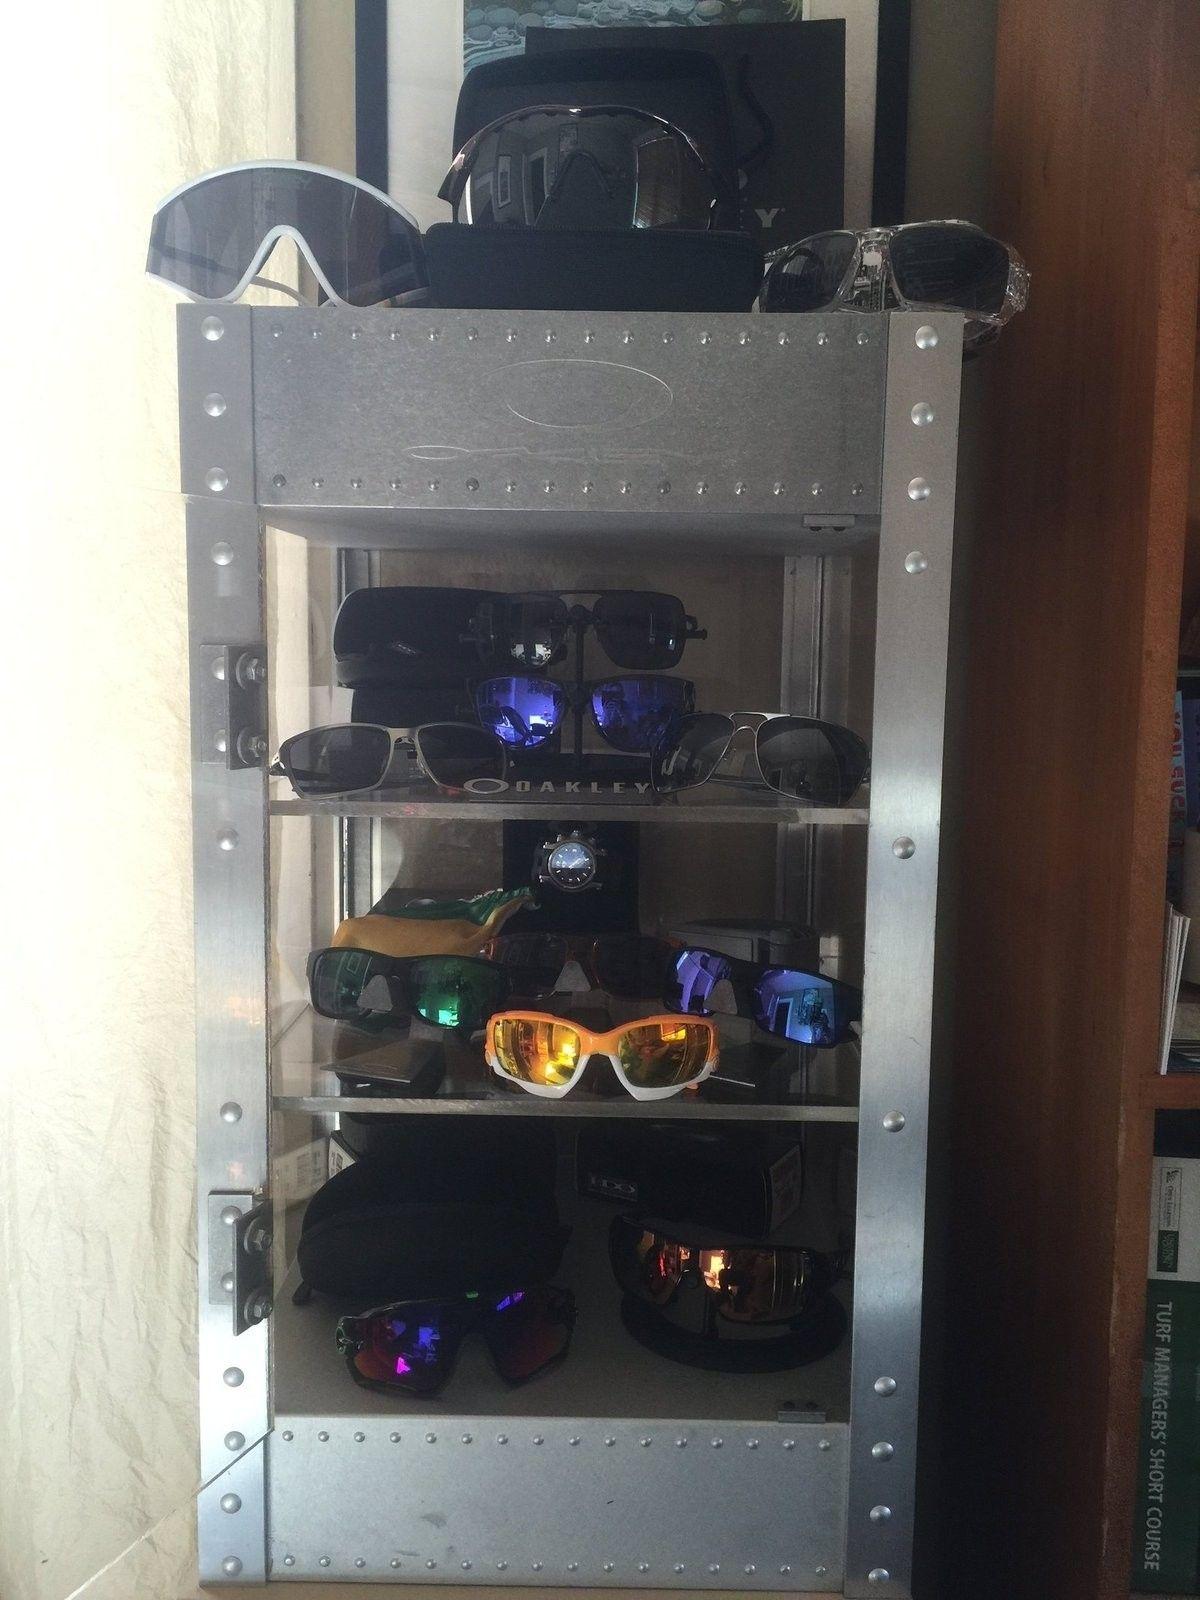 My collection so far - IMG_1464.JPG